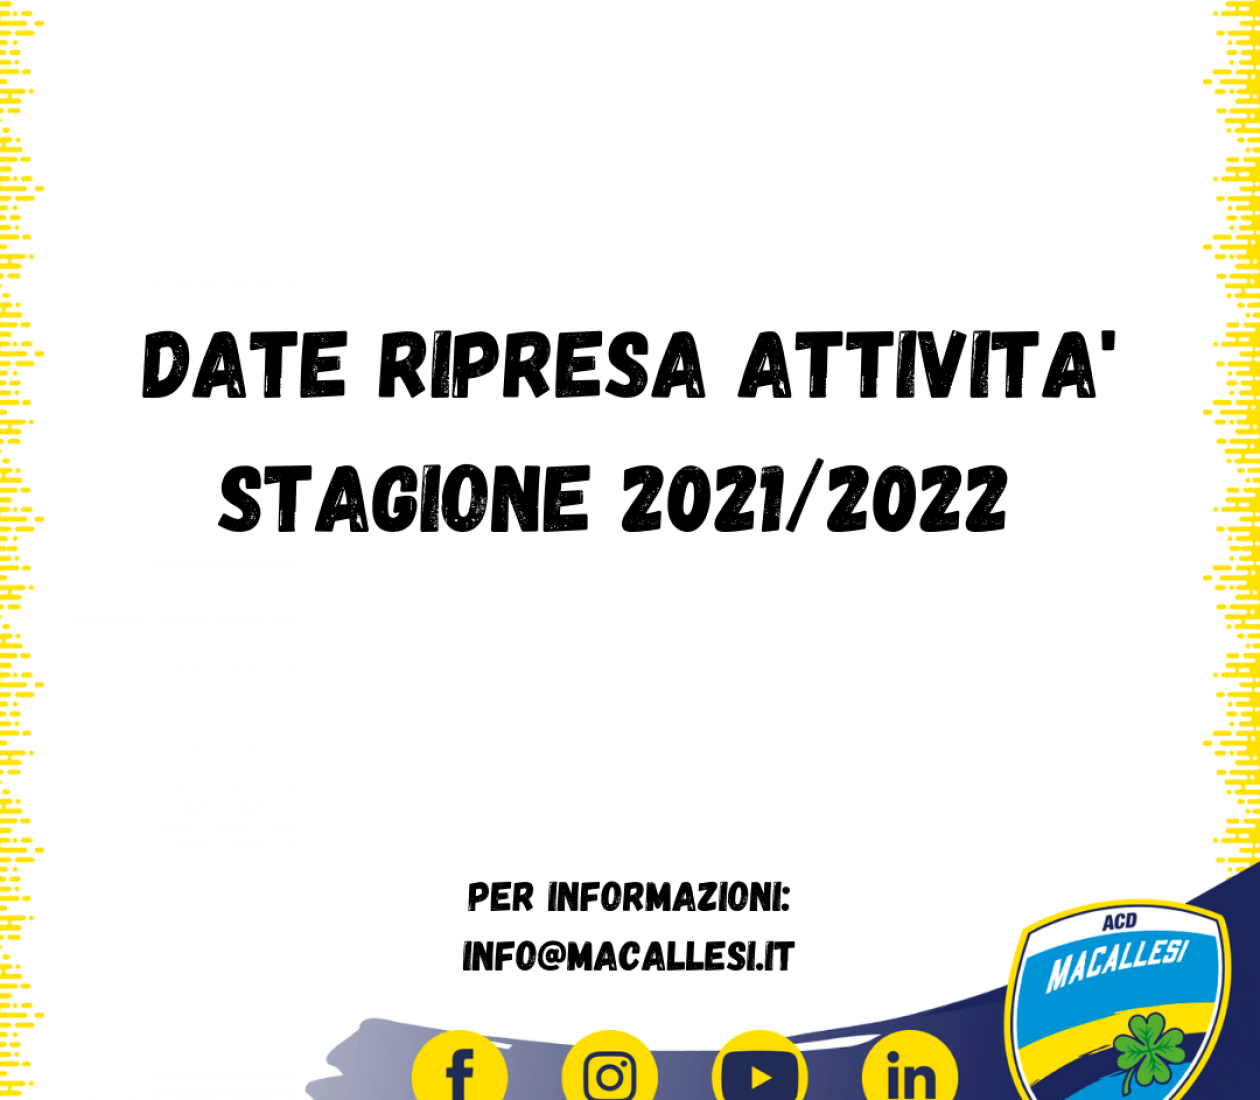 Date ripresa attività Stagione 2021/2022